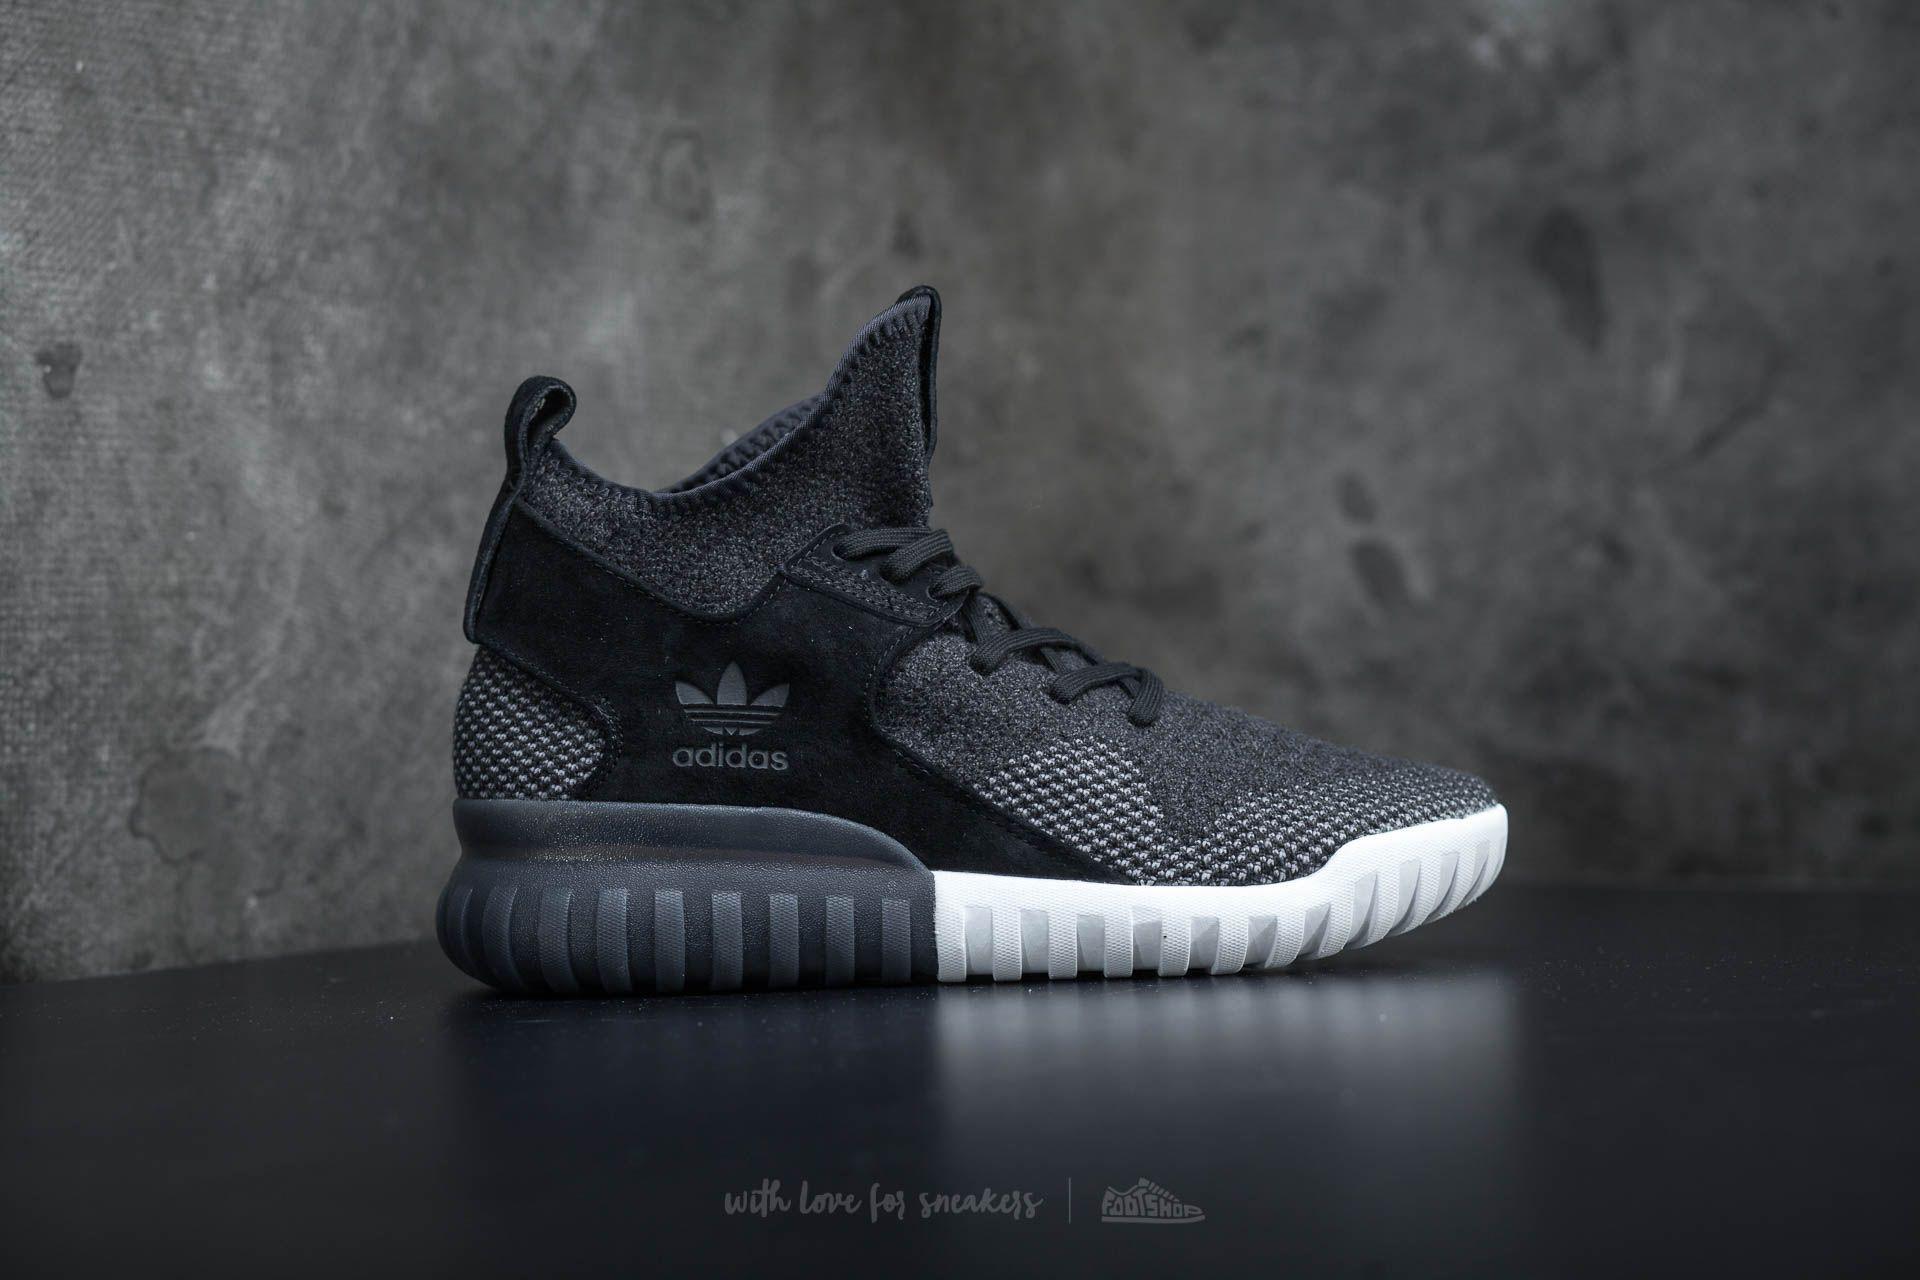 4012778a4784 ... usa lyst adidas originals adidas tubular x primeknit core black dark  463bc f5519